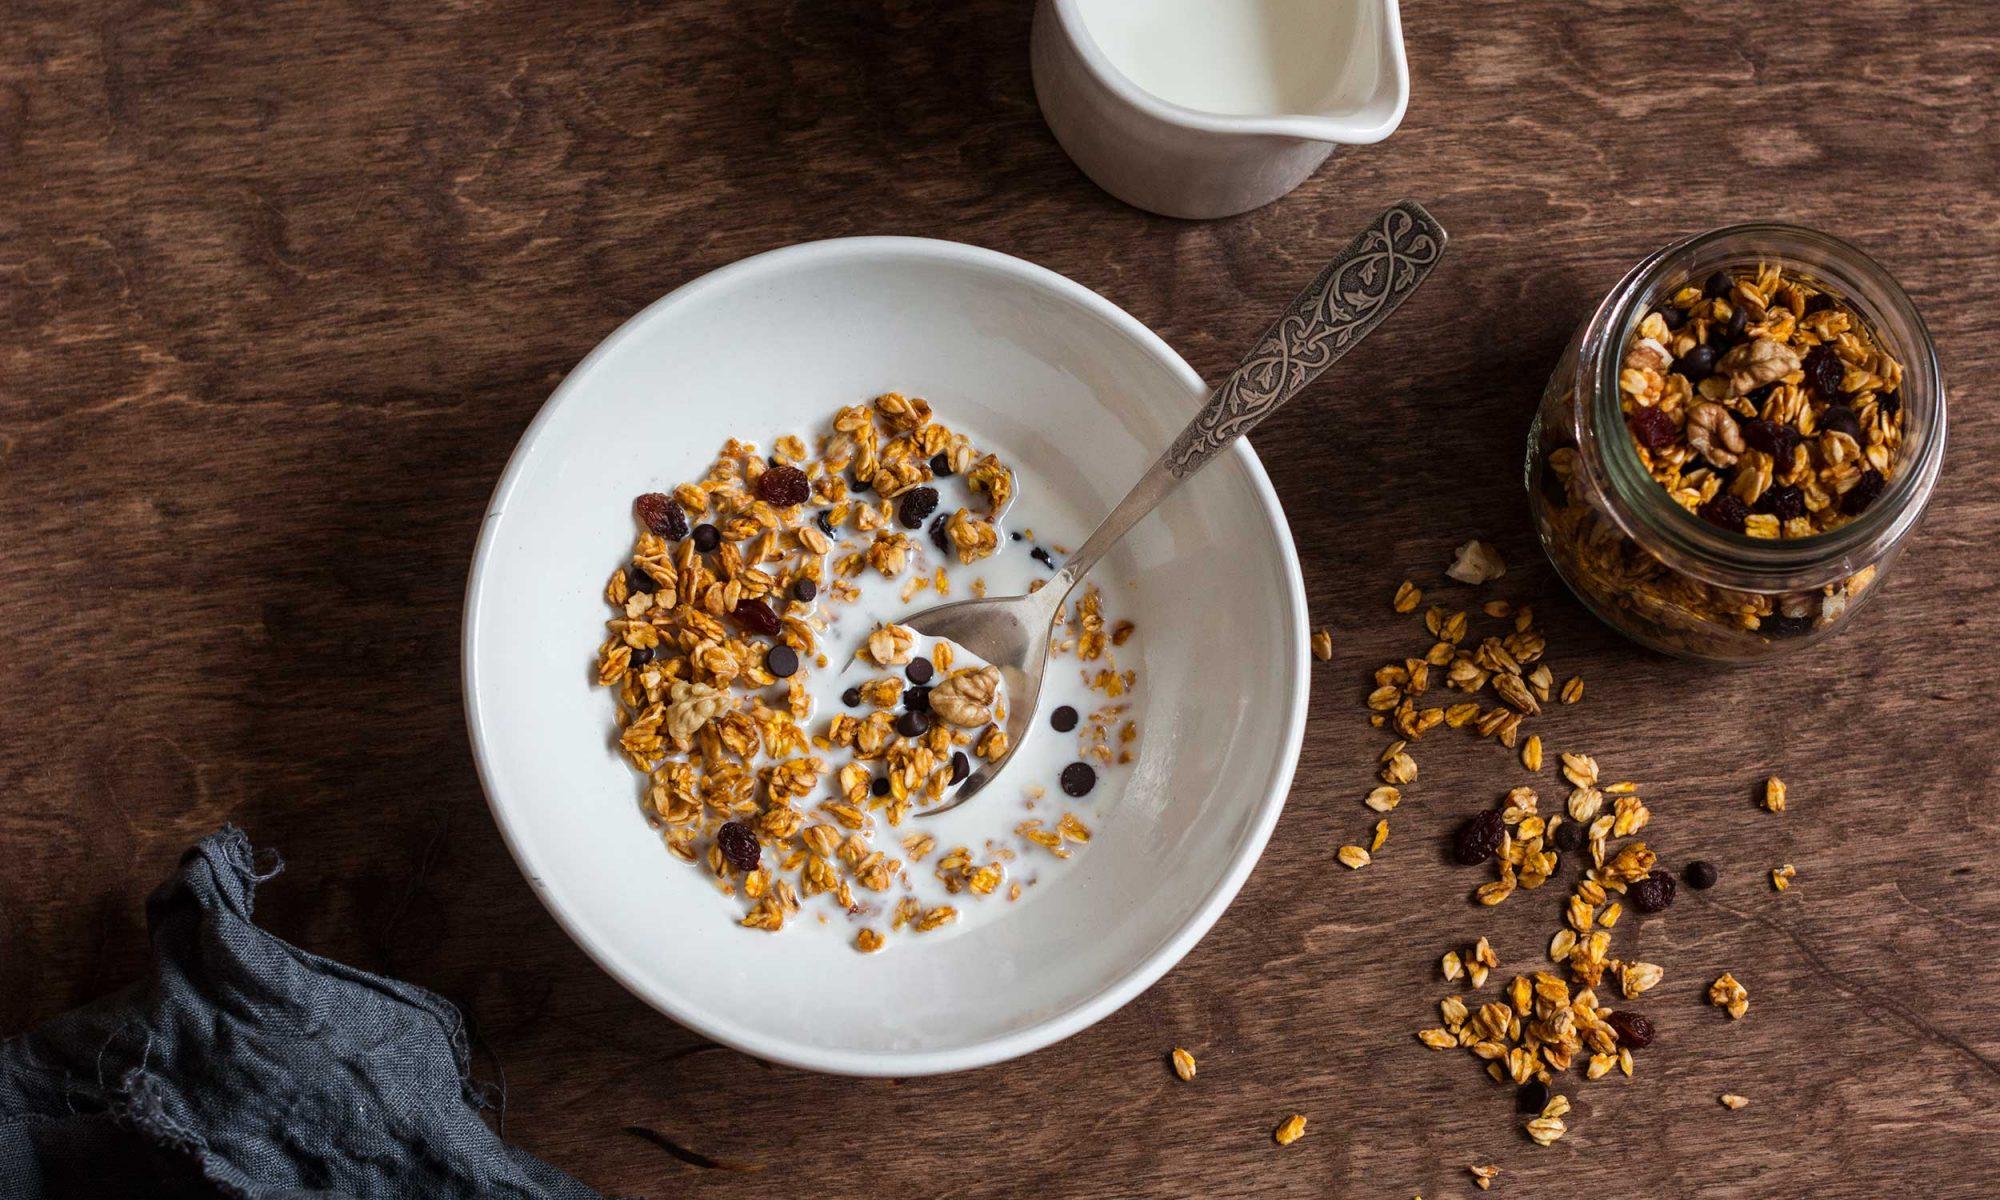 EC: FDA Rejects 'Love' as Granola Ingredient